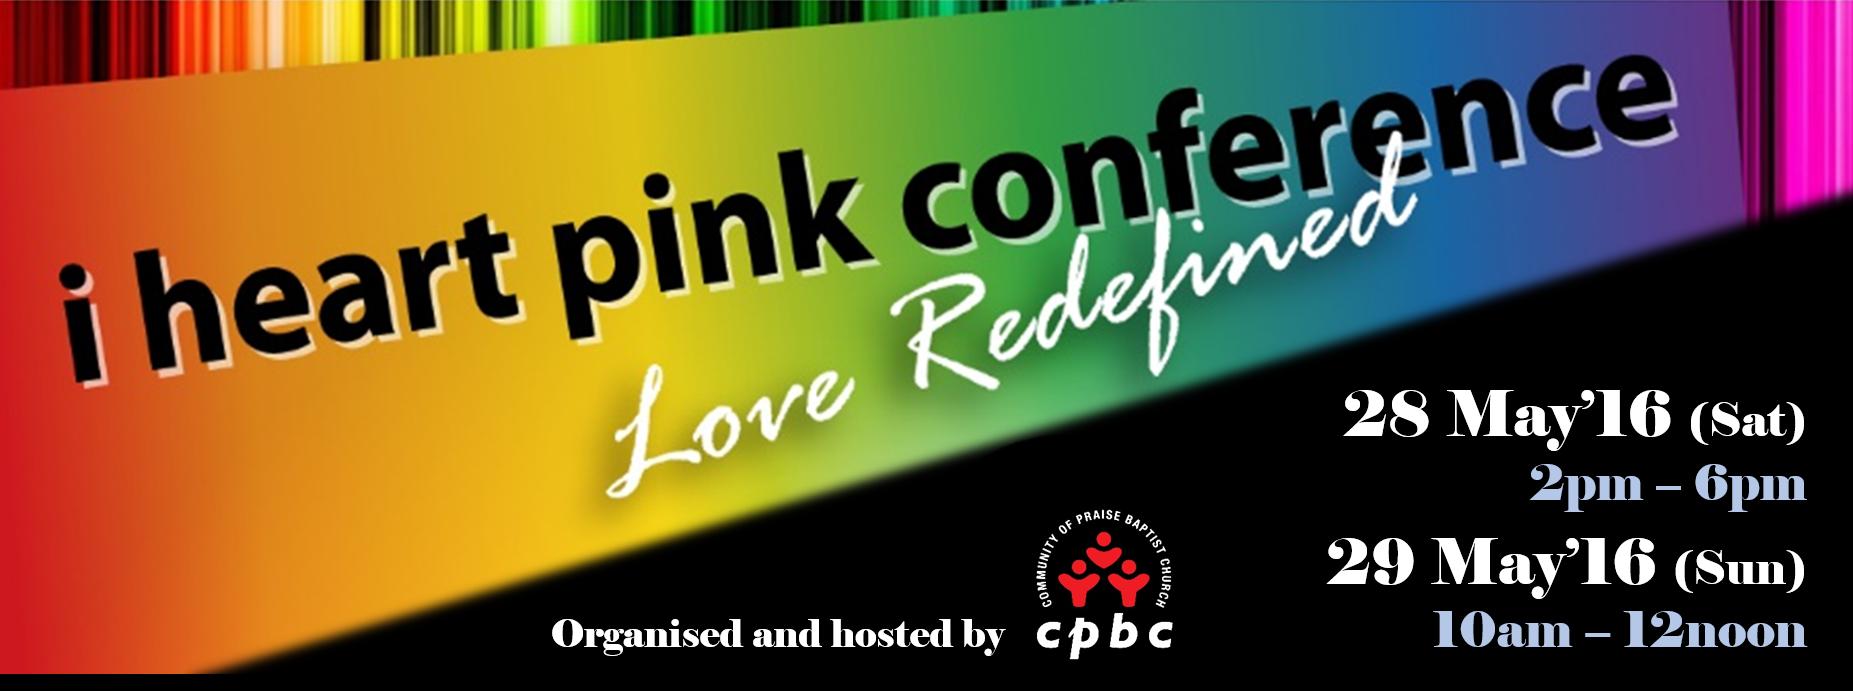 I HEART Pink Conference Banner Image